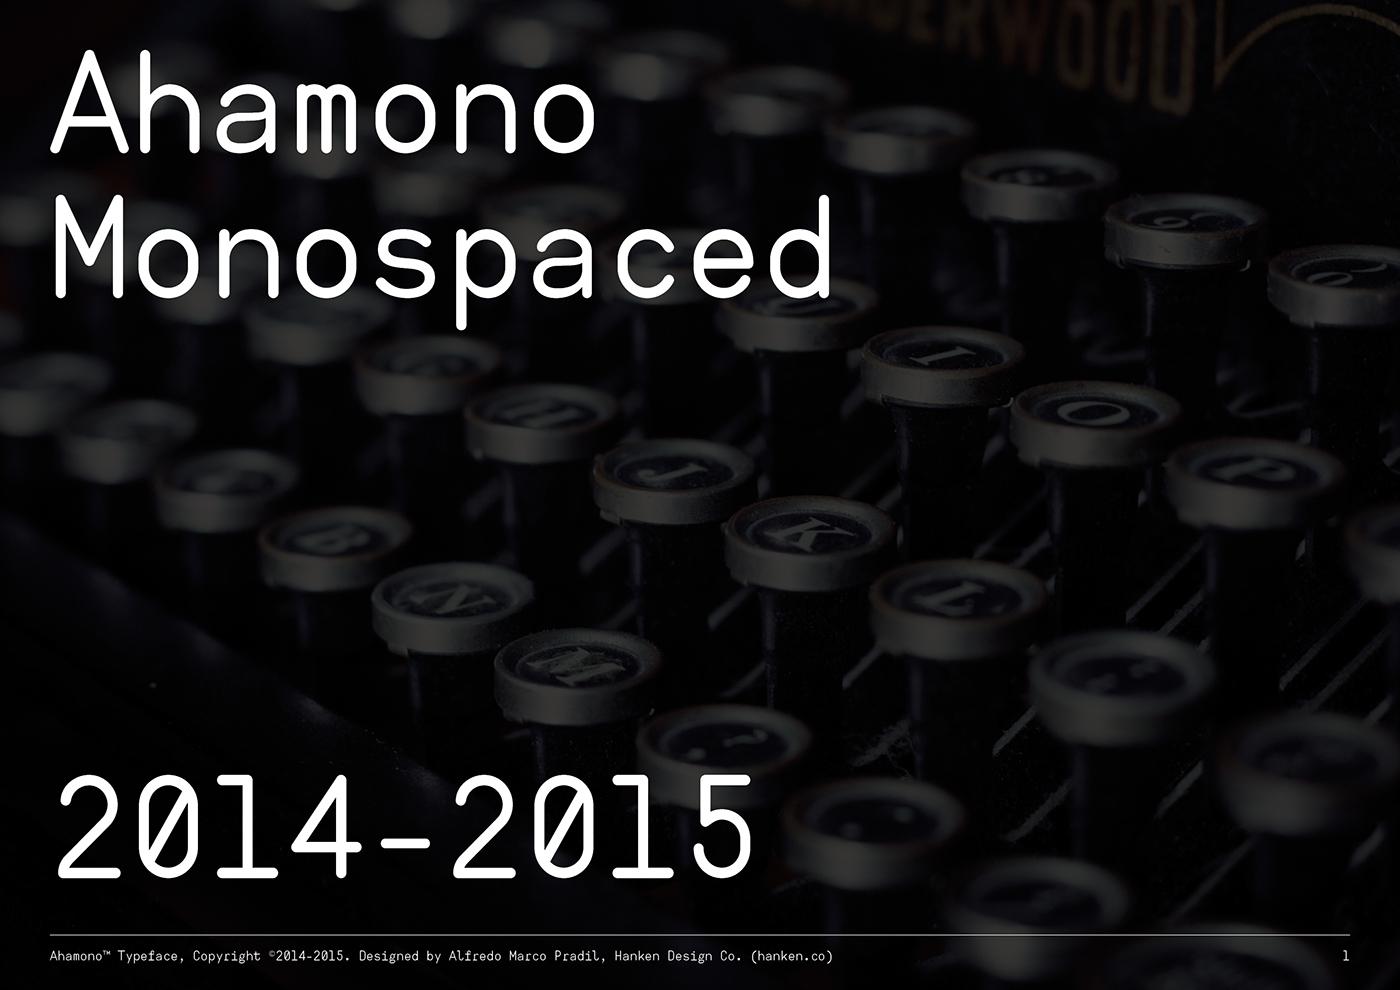 monospaced font ahamono Typeface regular download webapp Website application